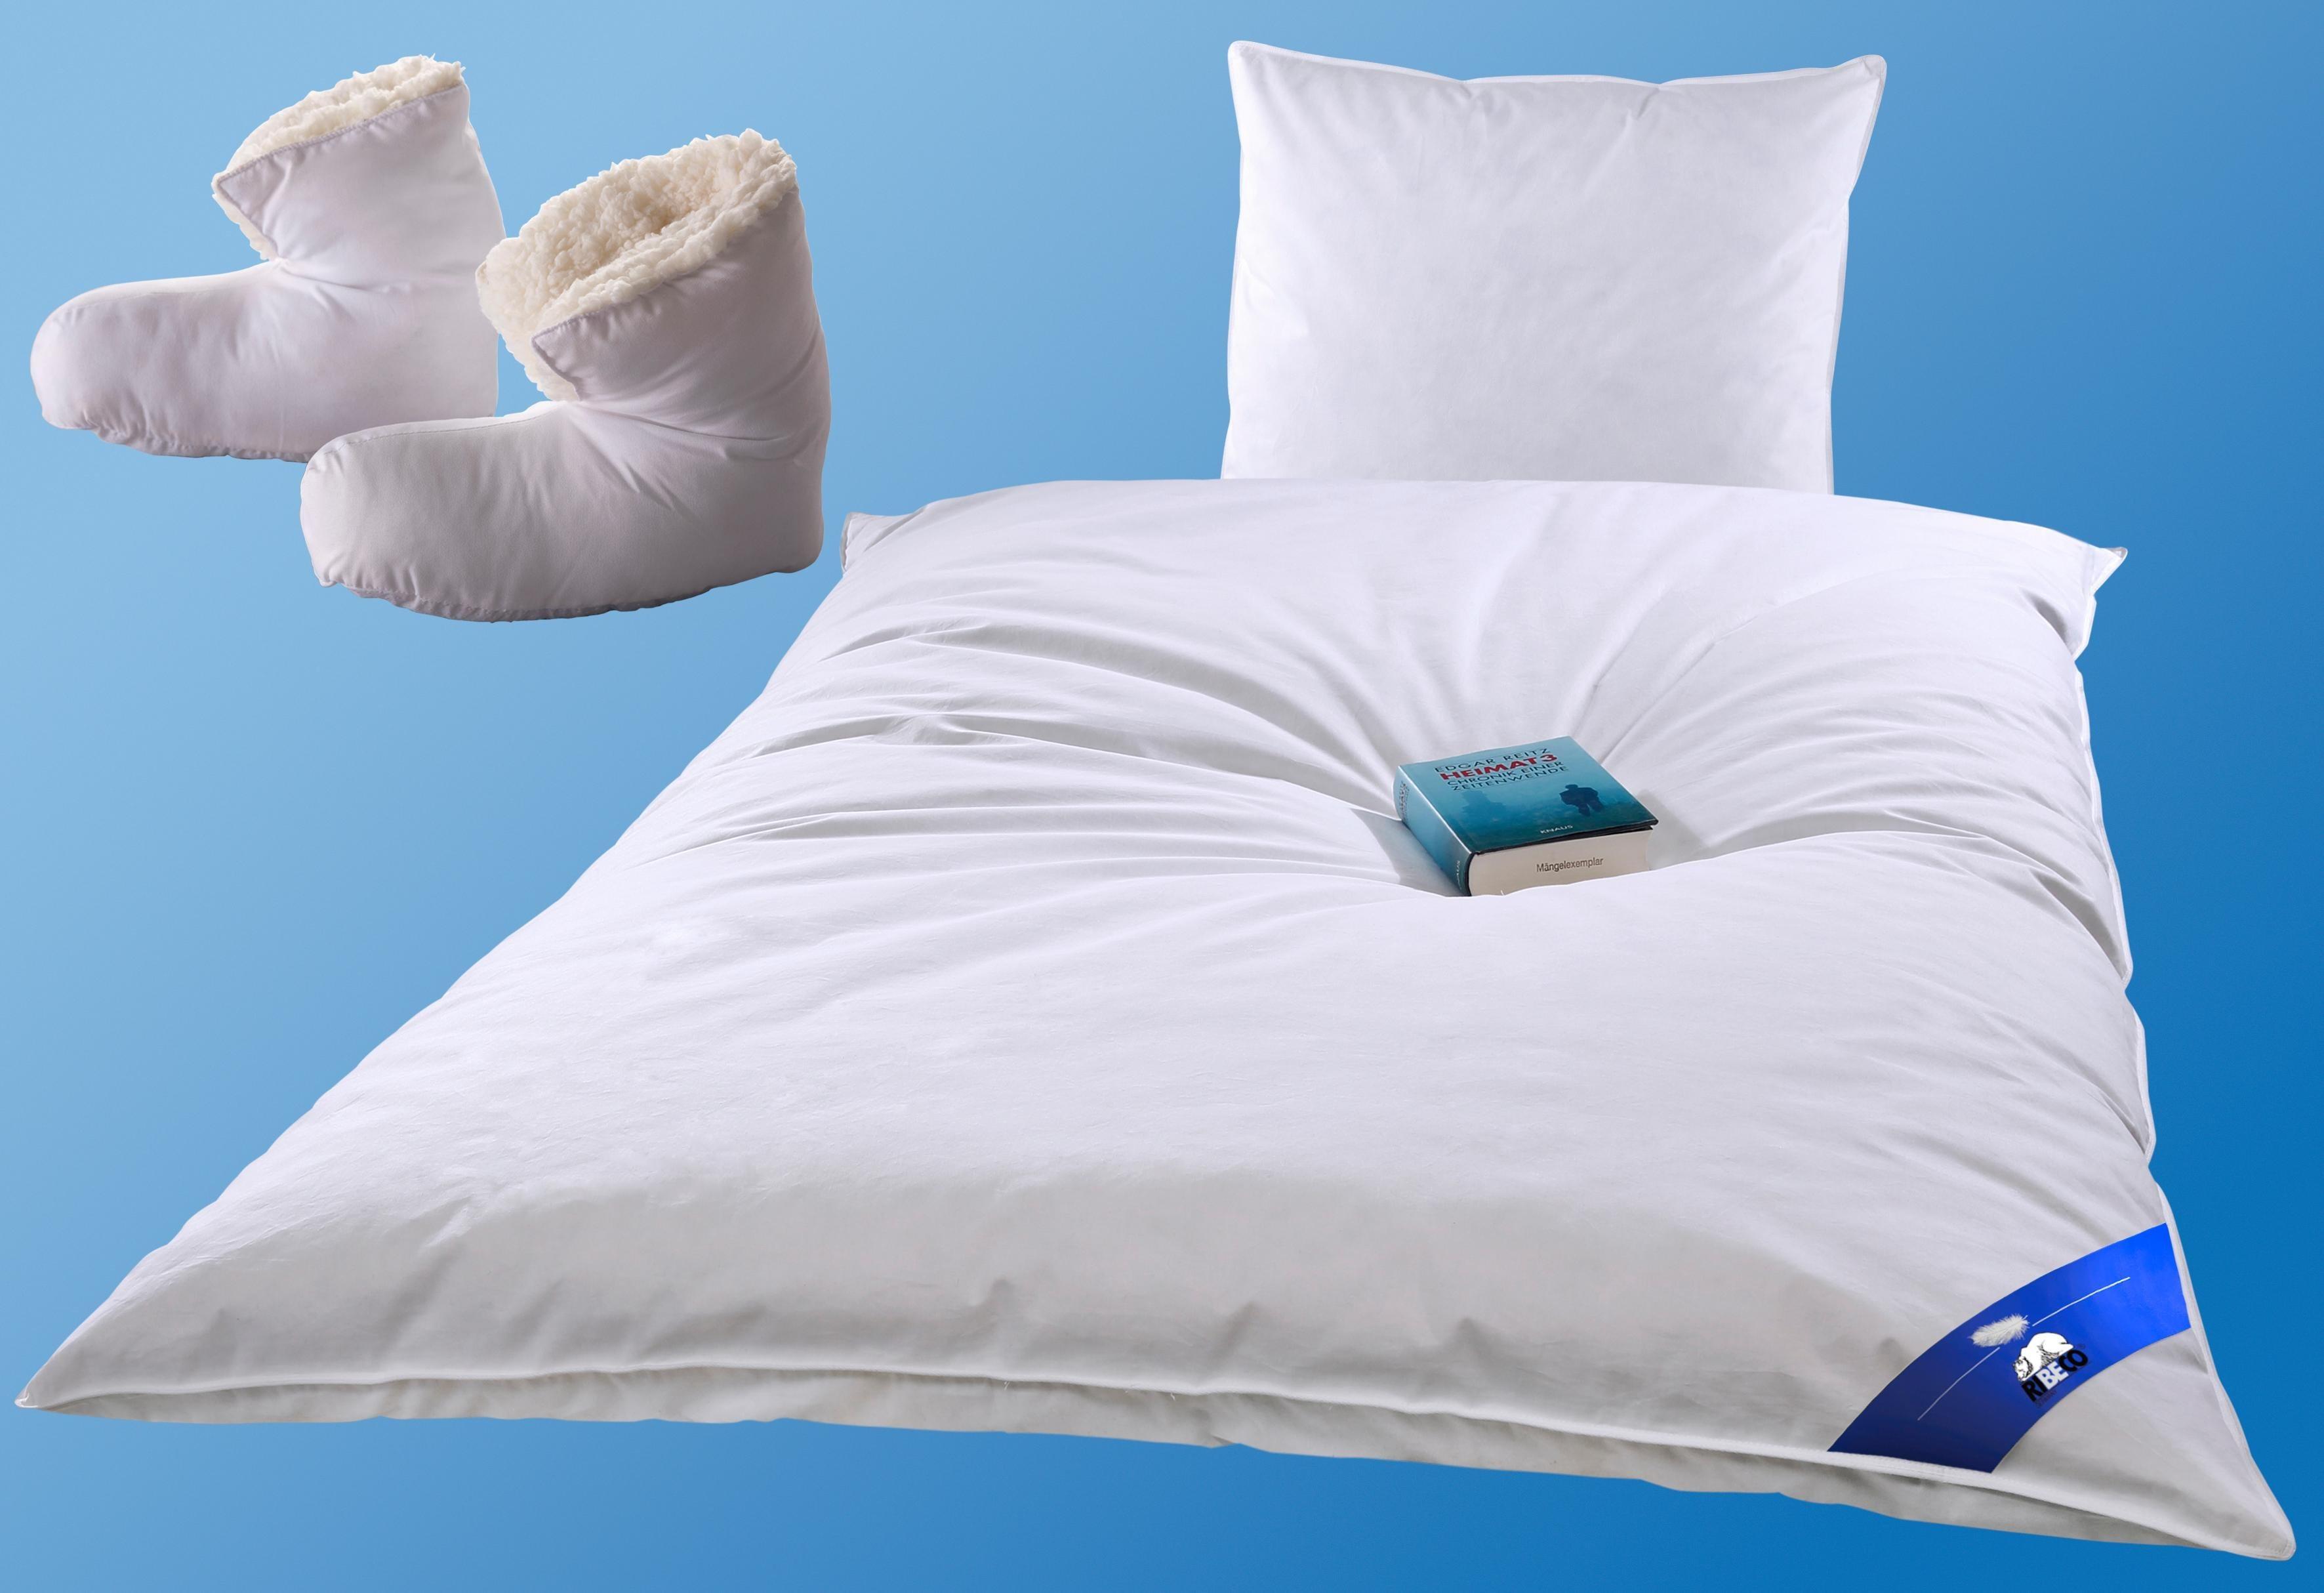 Federbettdecke, »Liam«, RIBECO, extrawarm, Füllung: 100% Federn, (2-tlg) | Heimtextilien > Decken und Kissen > Bettdecken | RIBECO